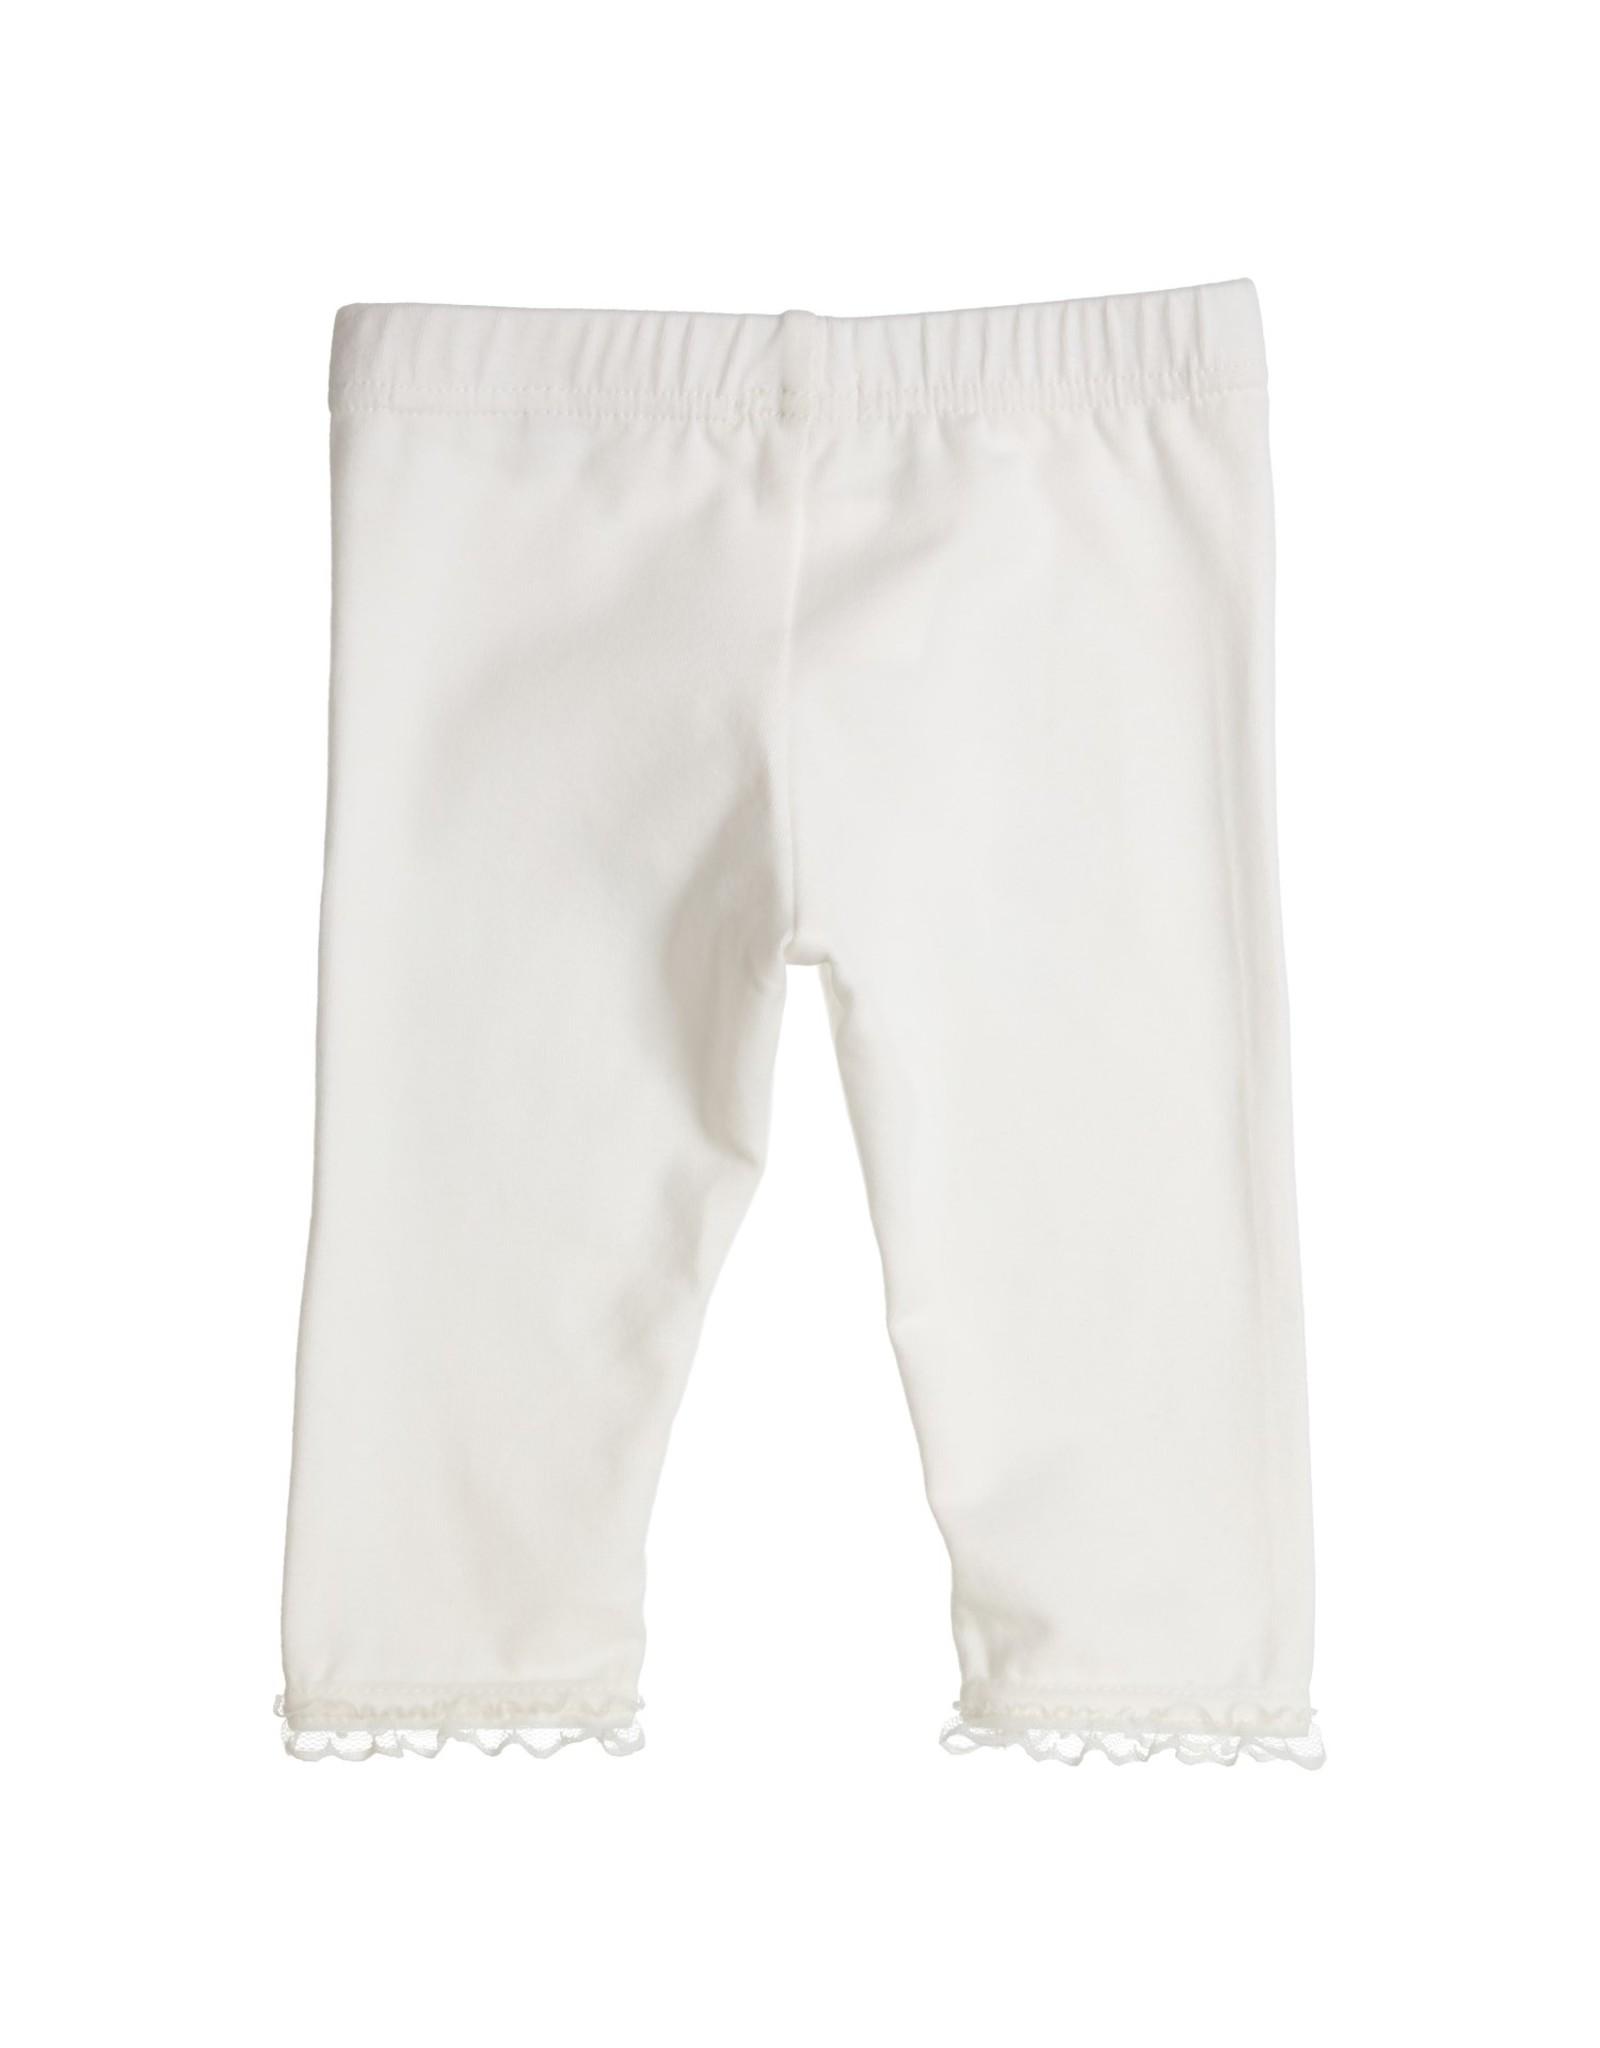 Gymp LEGGING - RUFFLE,  OFF-WHITE